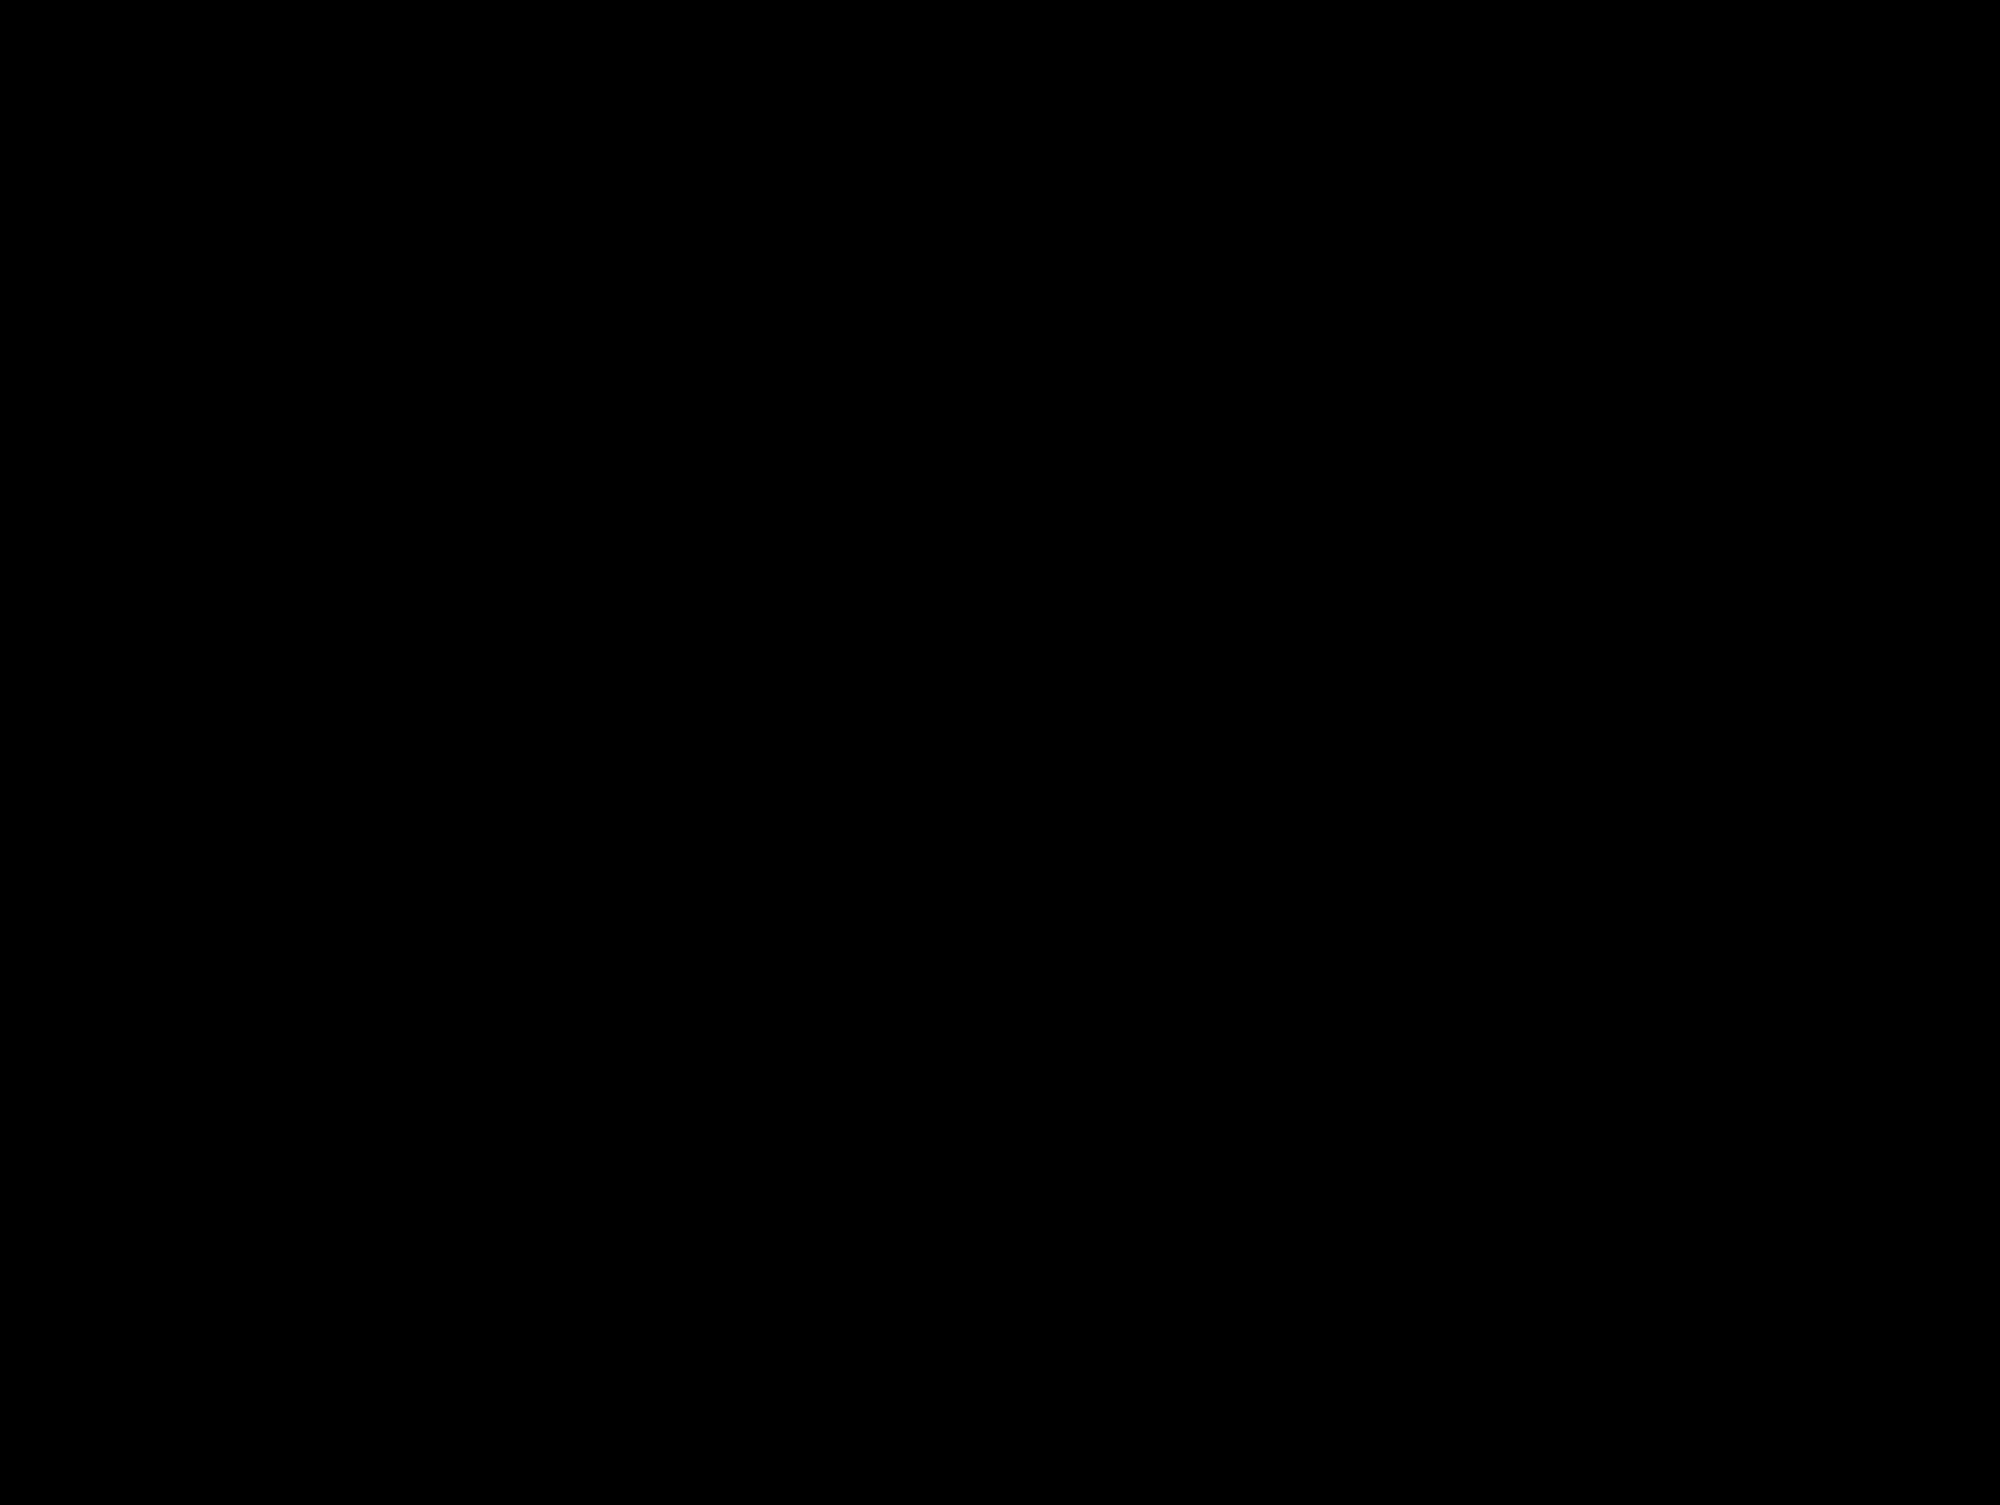 4 pkn. Dråpefrisk Citruspresse